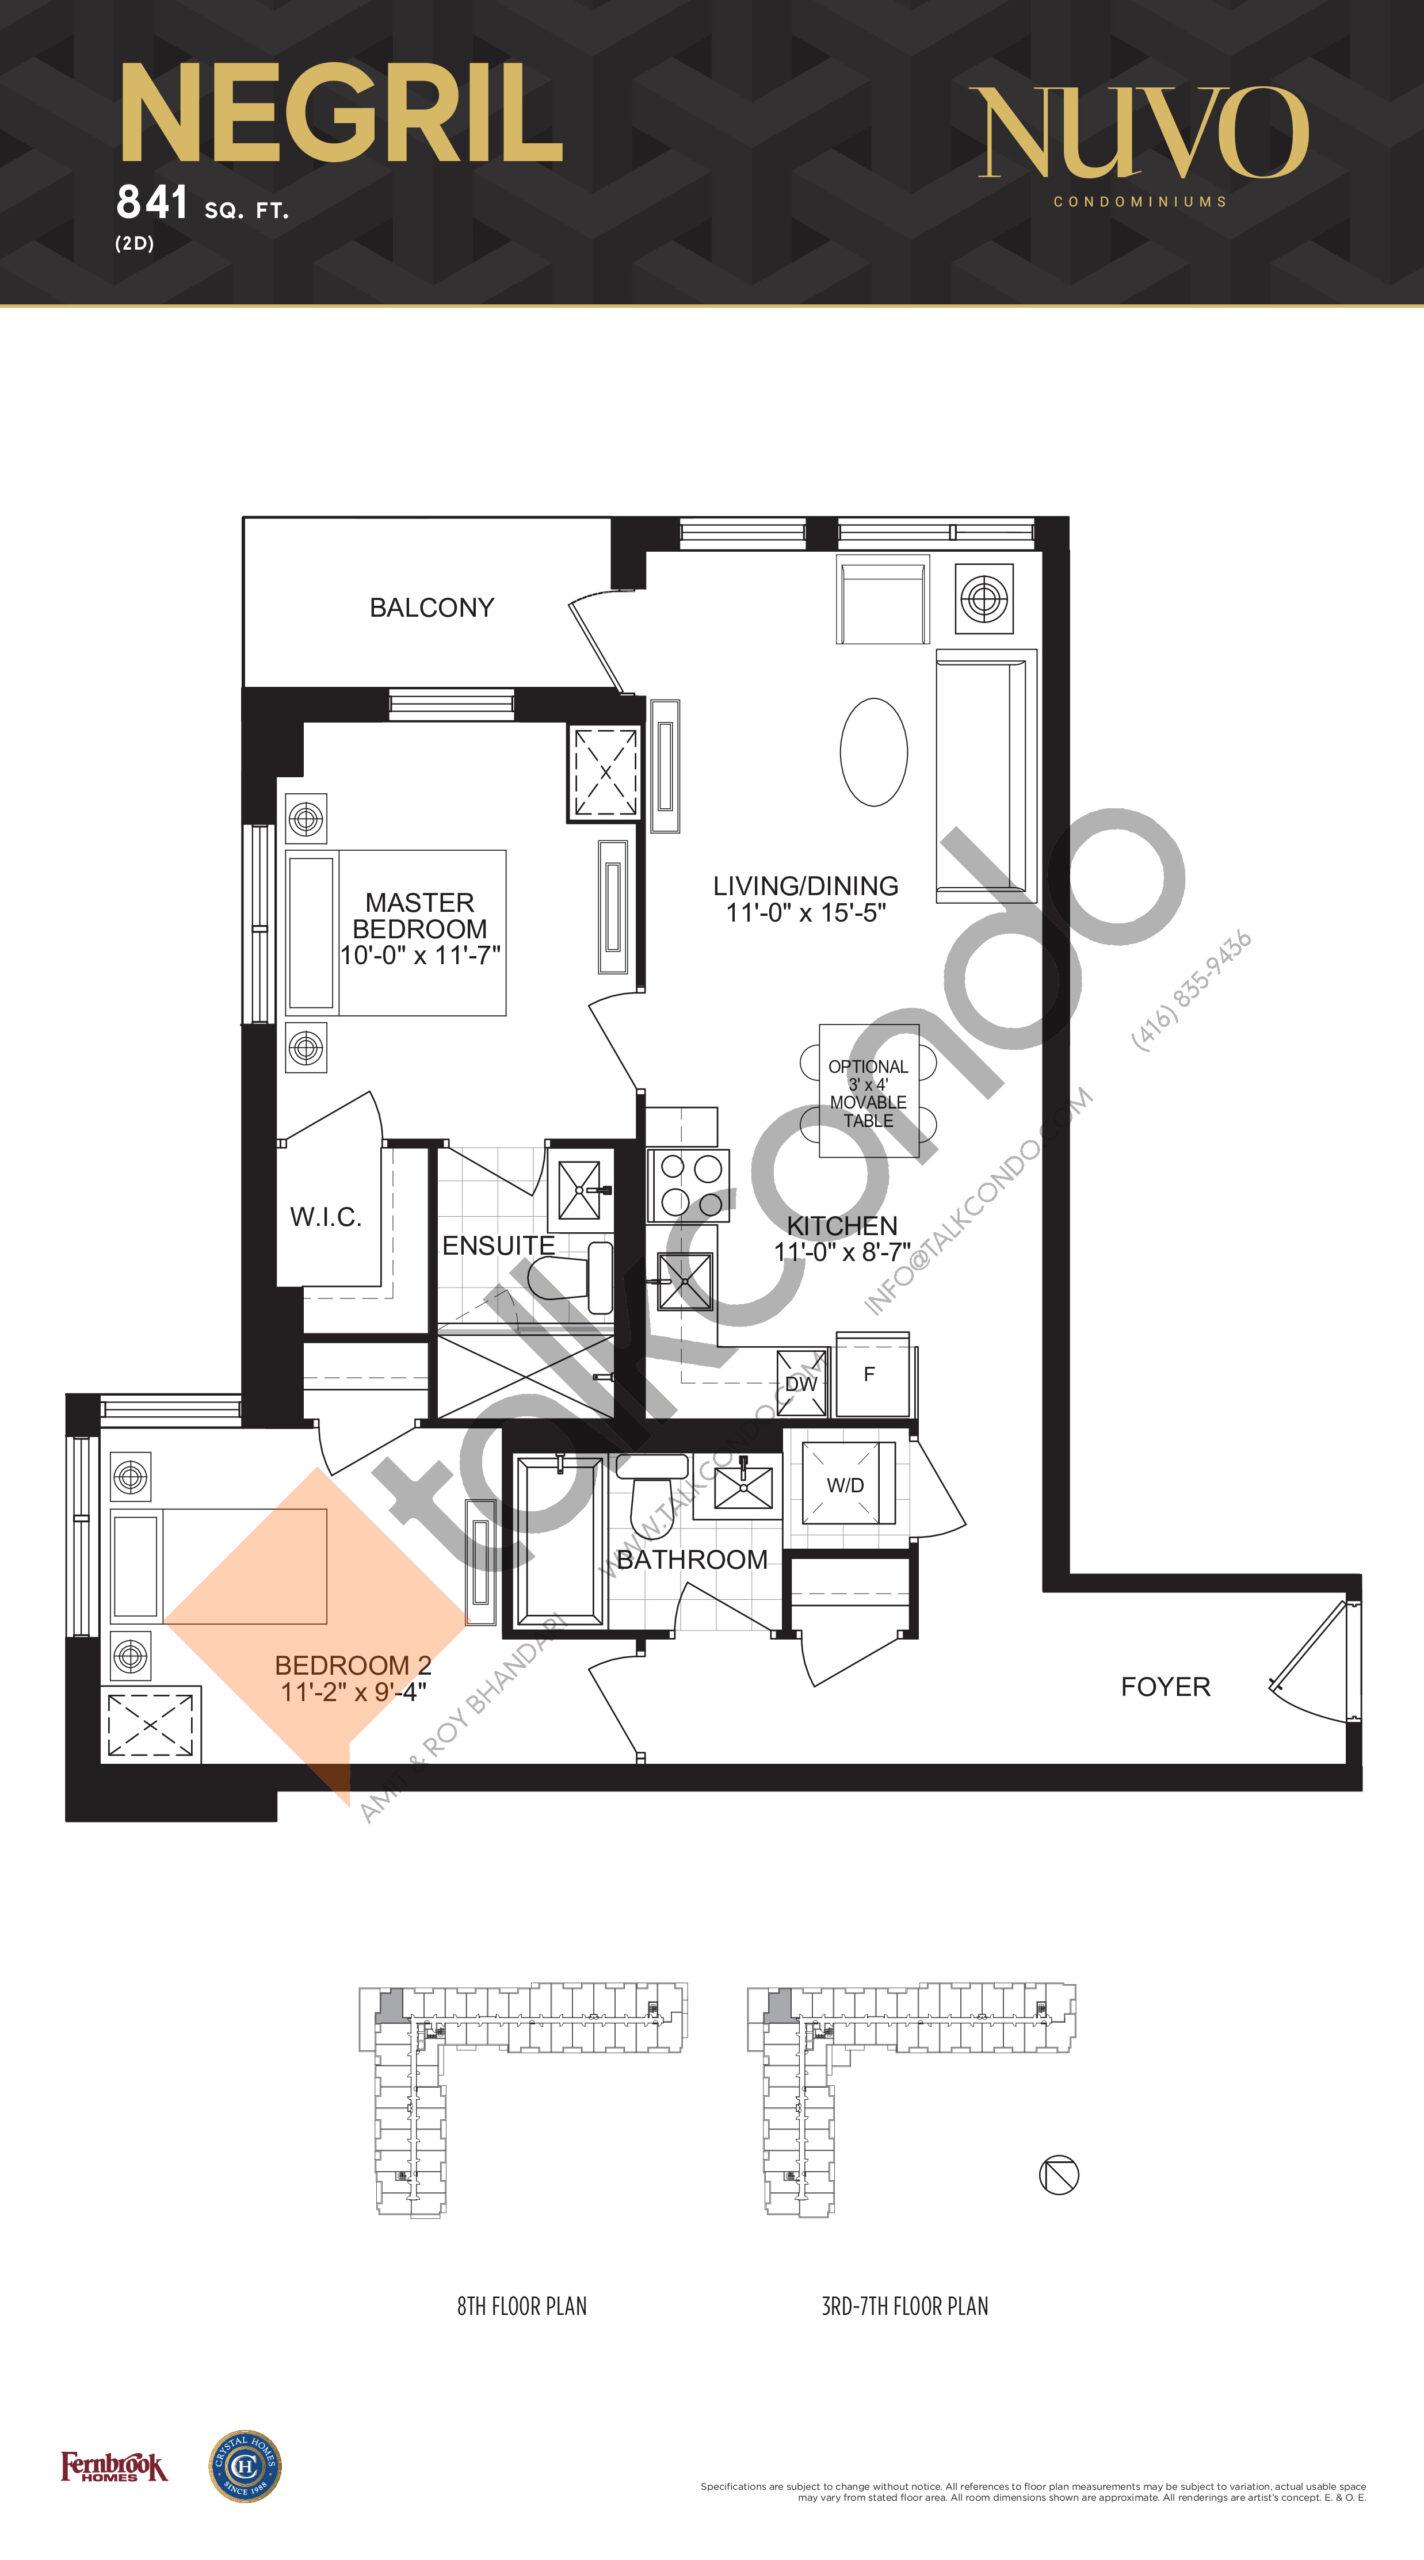 Negril Floor Plan at Nuvo Condos - 841 sq.ft